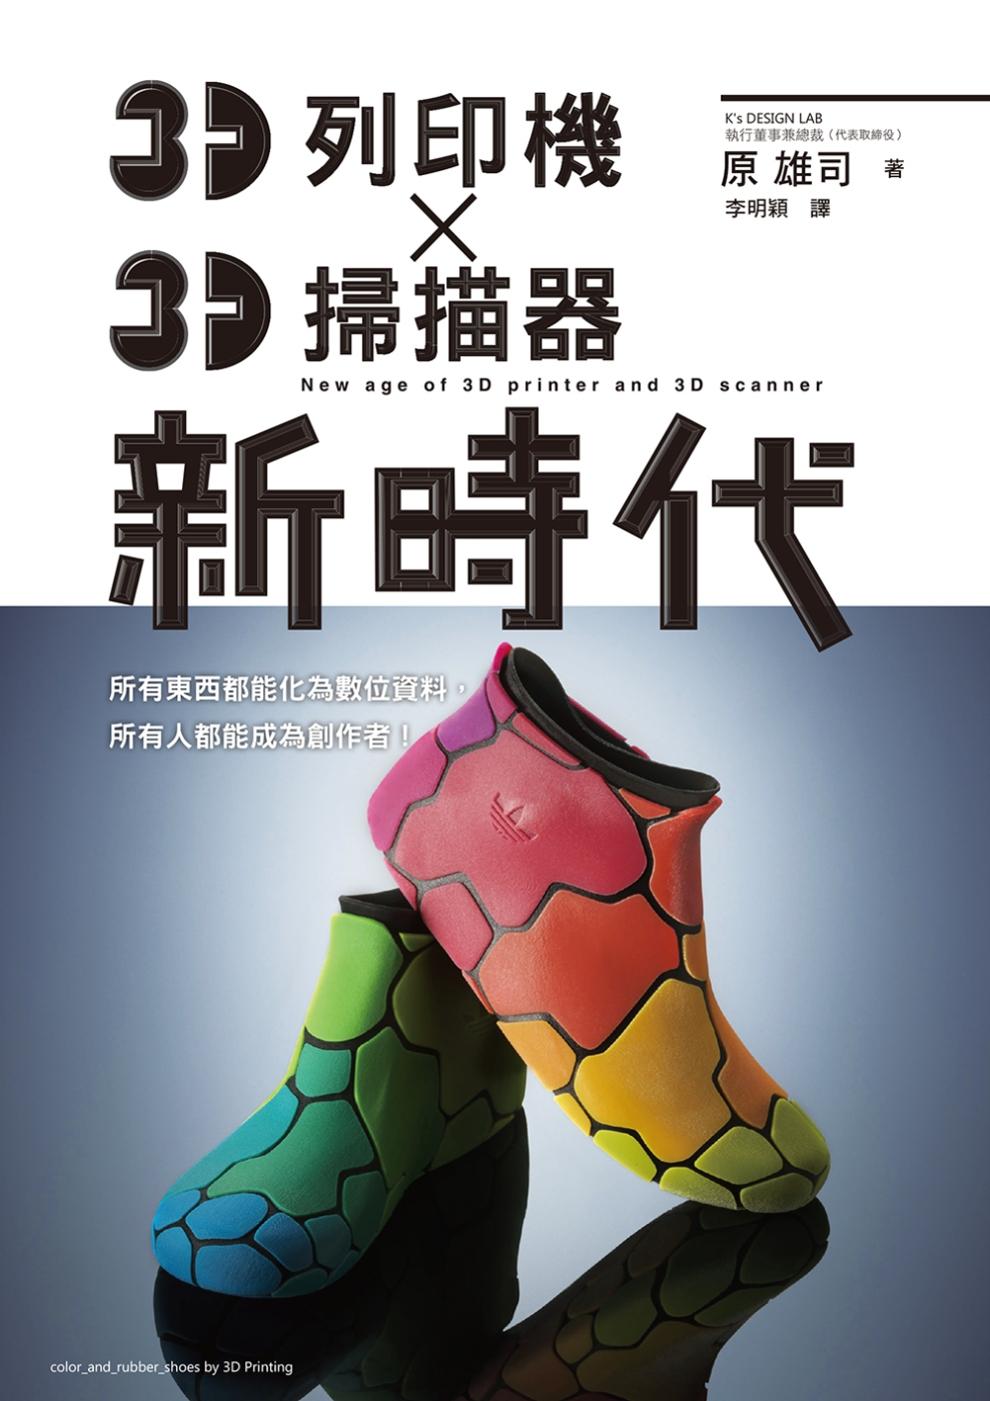 3D列印機 X 3D掃描器 新時代:任何人都能成為「Maker(製造商)」的時代!